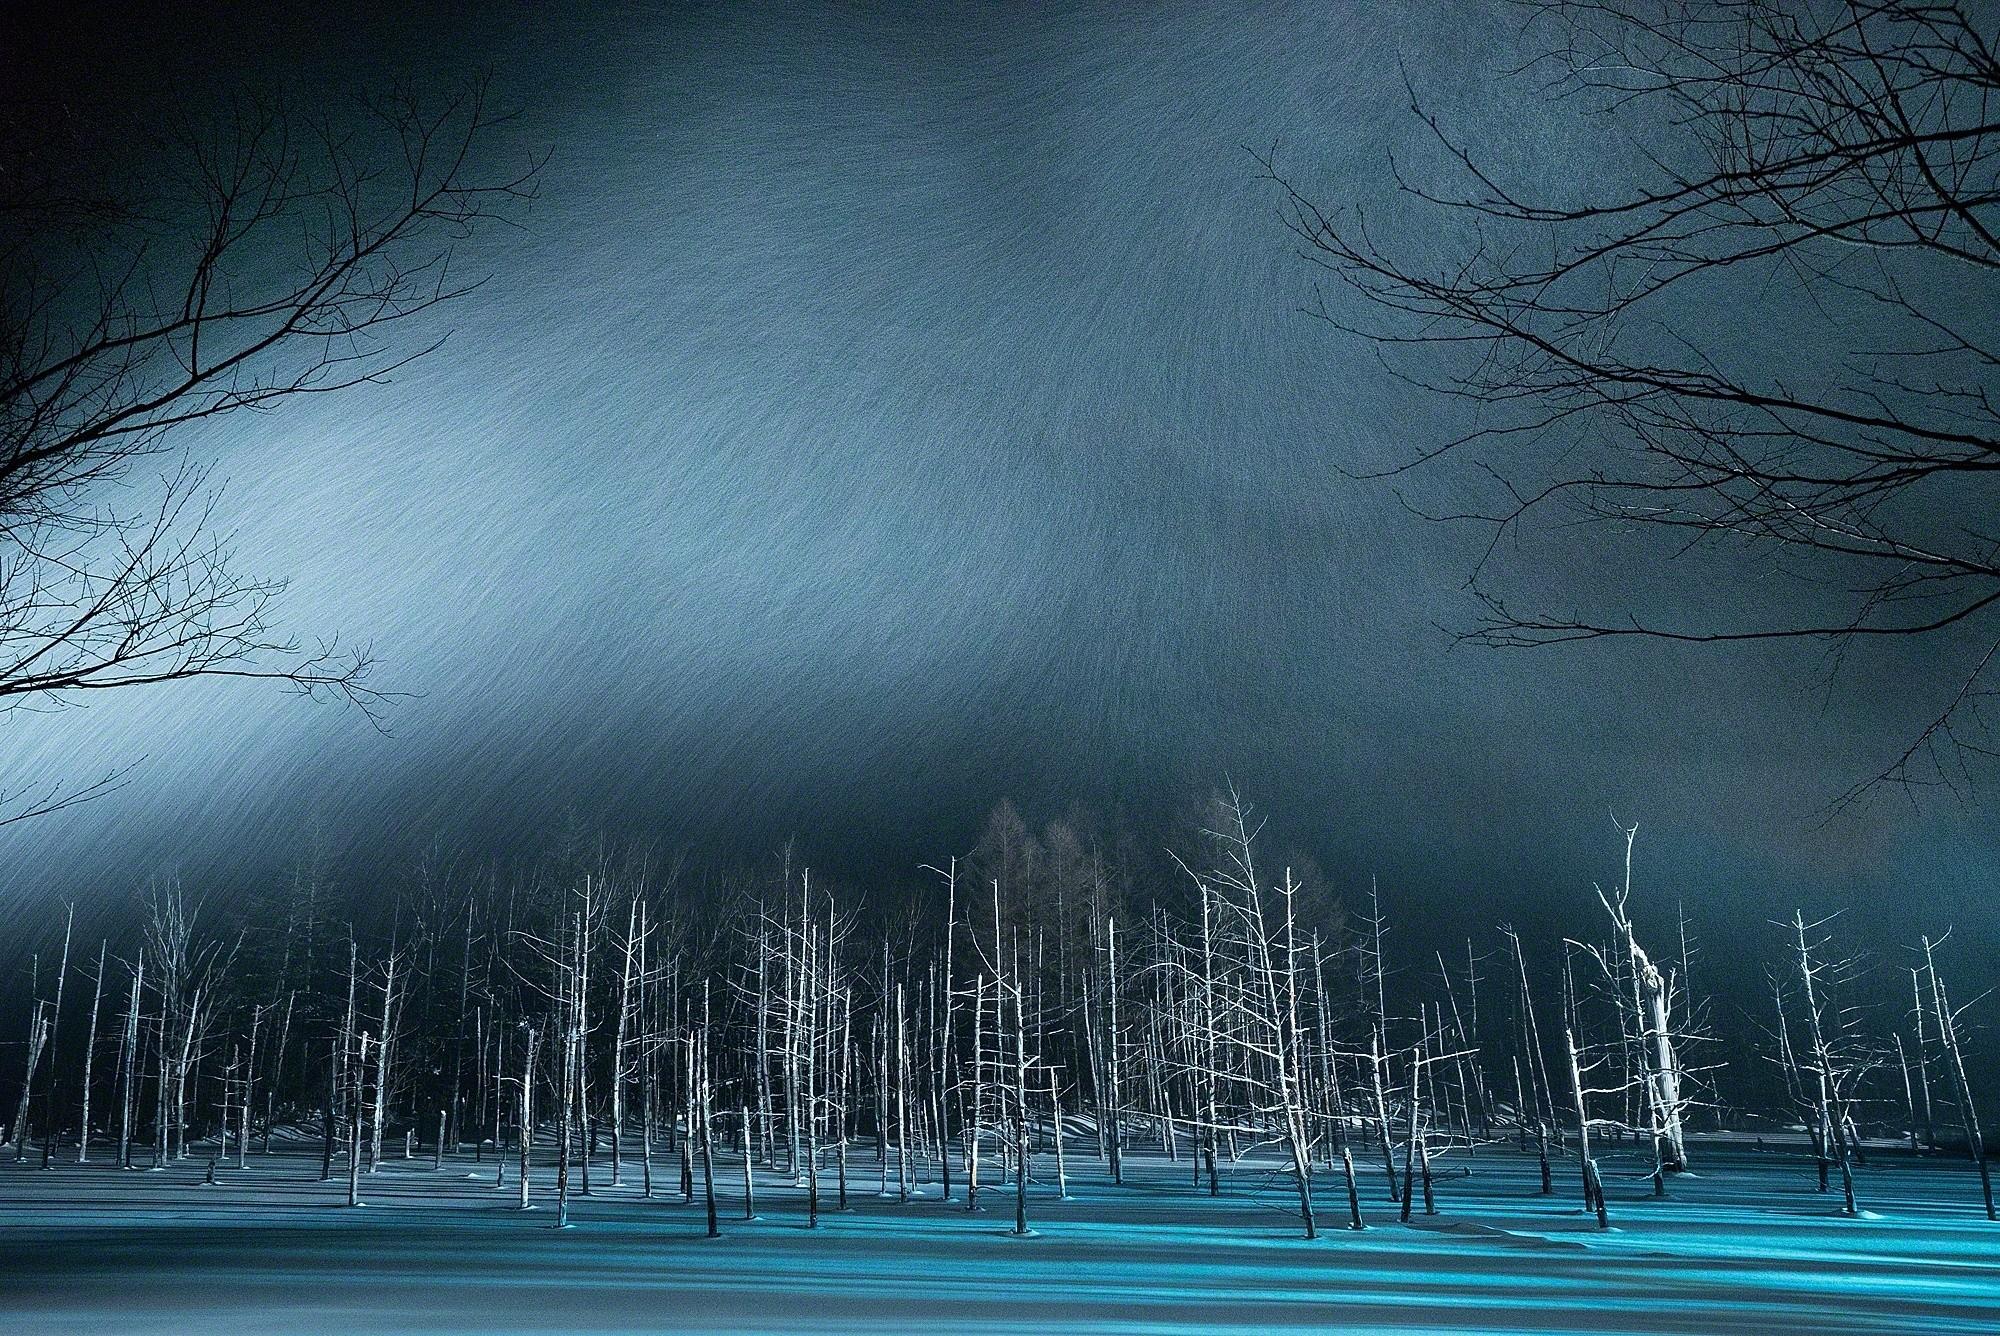 winter night snow trees 1574939595 - Winter Night Snow Trees -